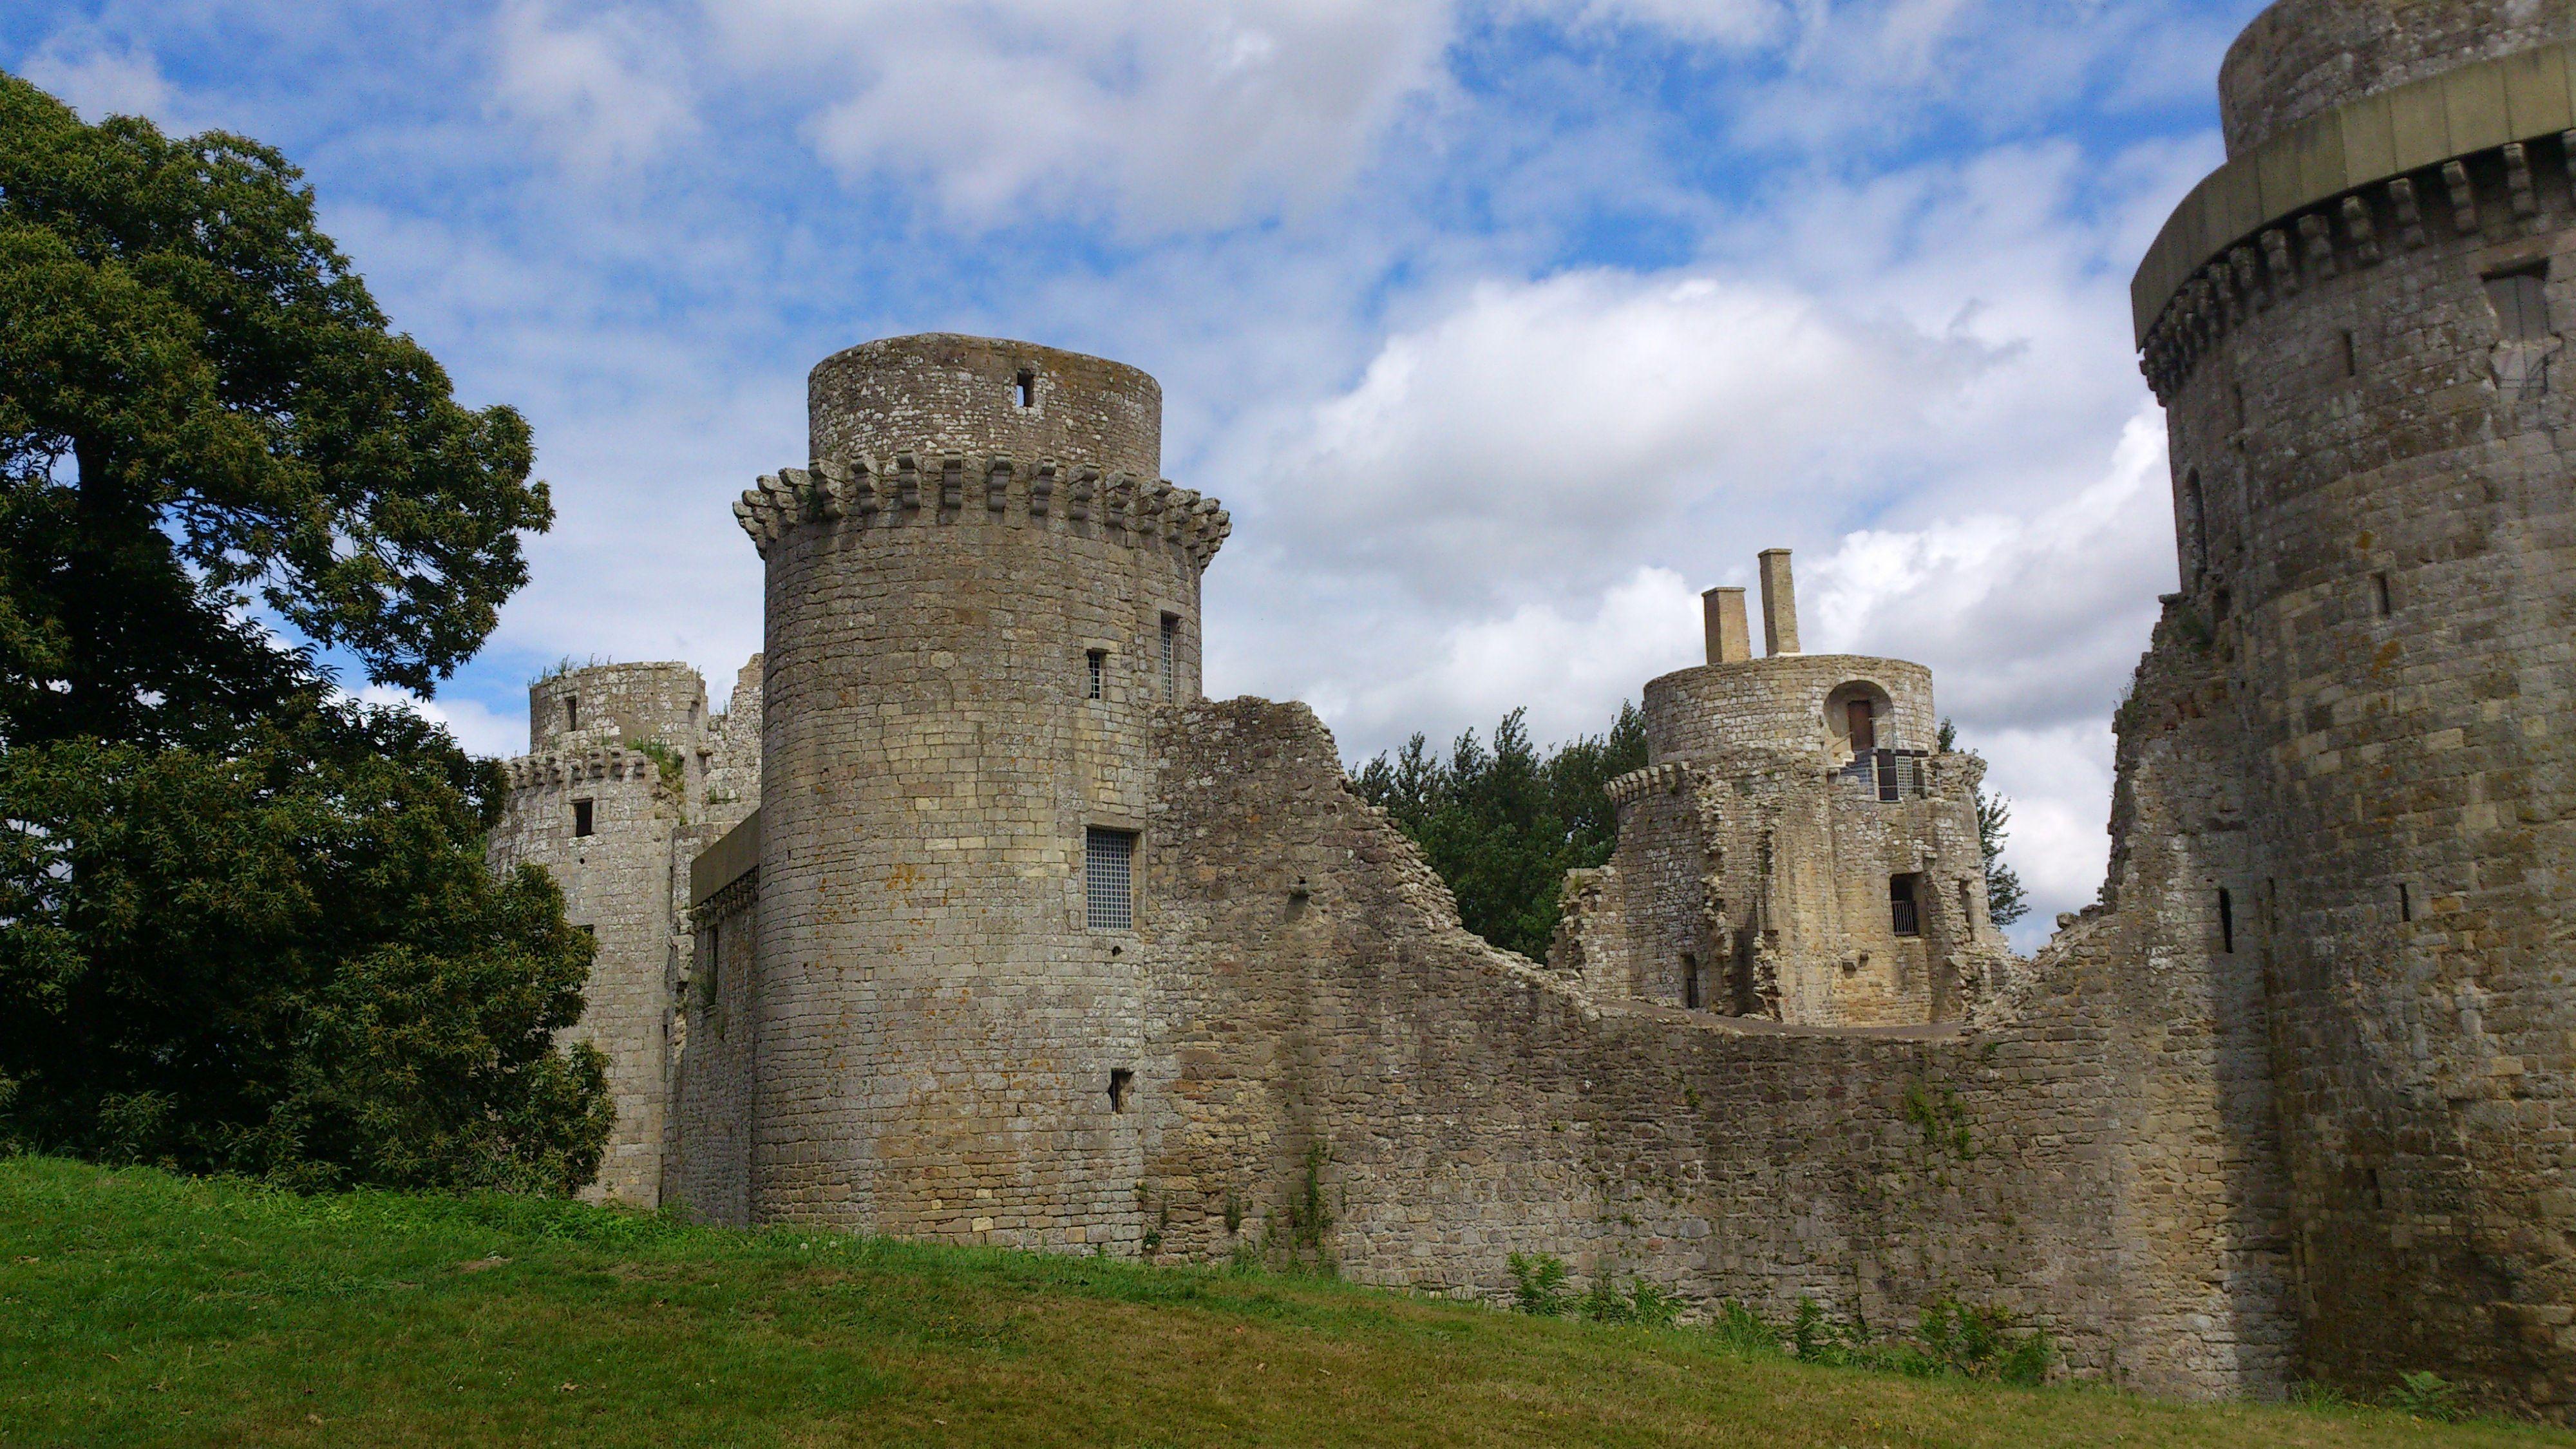 chateau de la hunaudaye 22 france